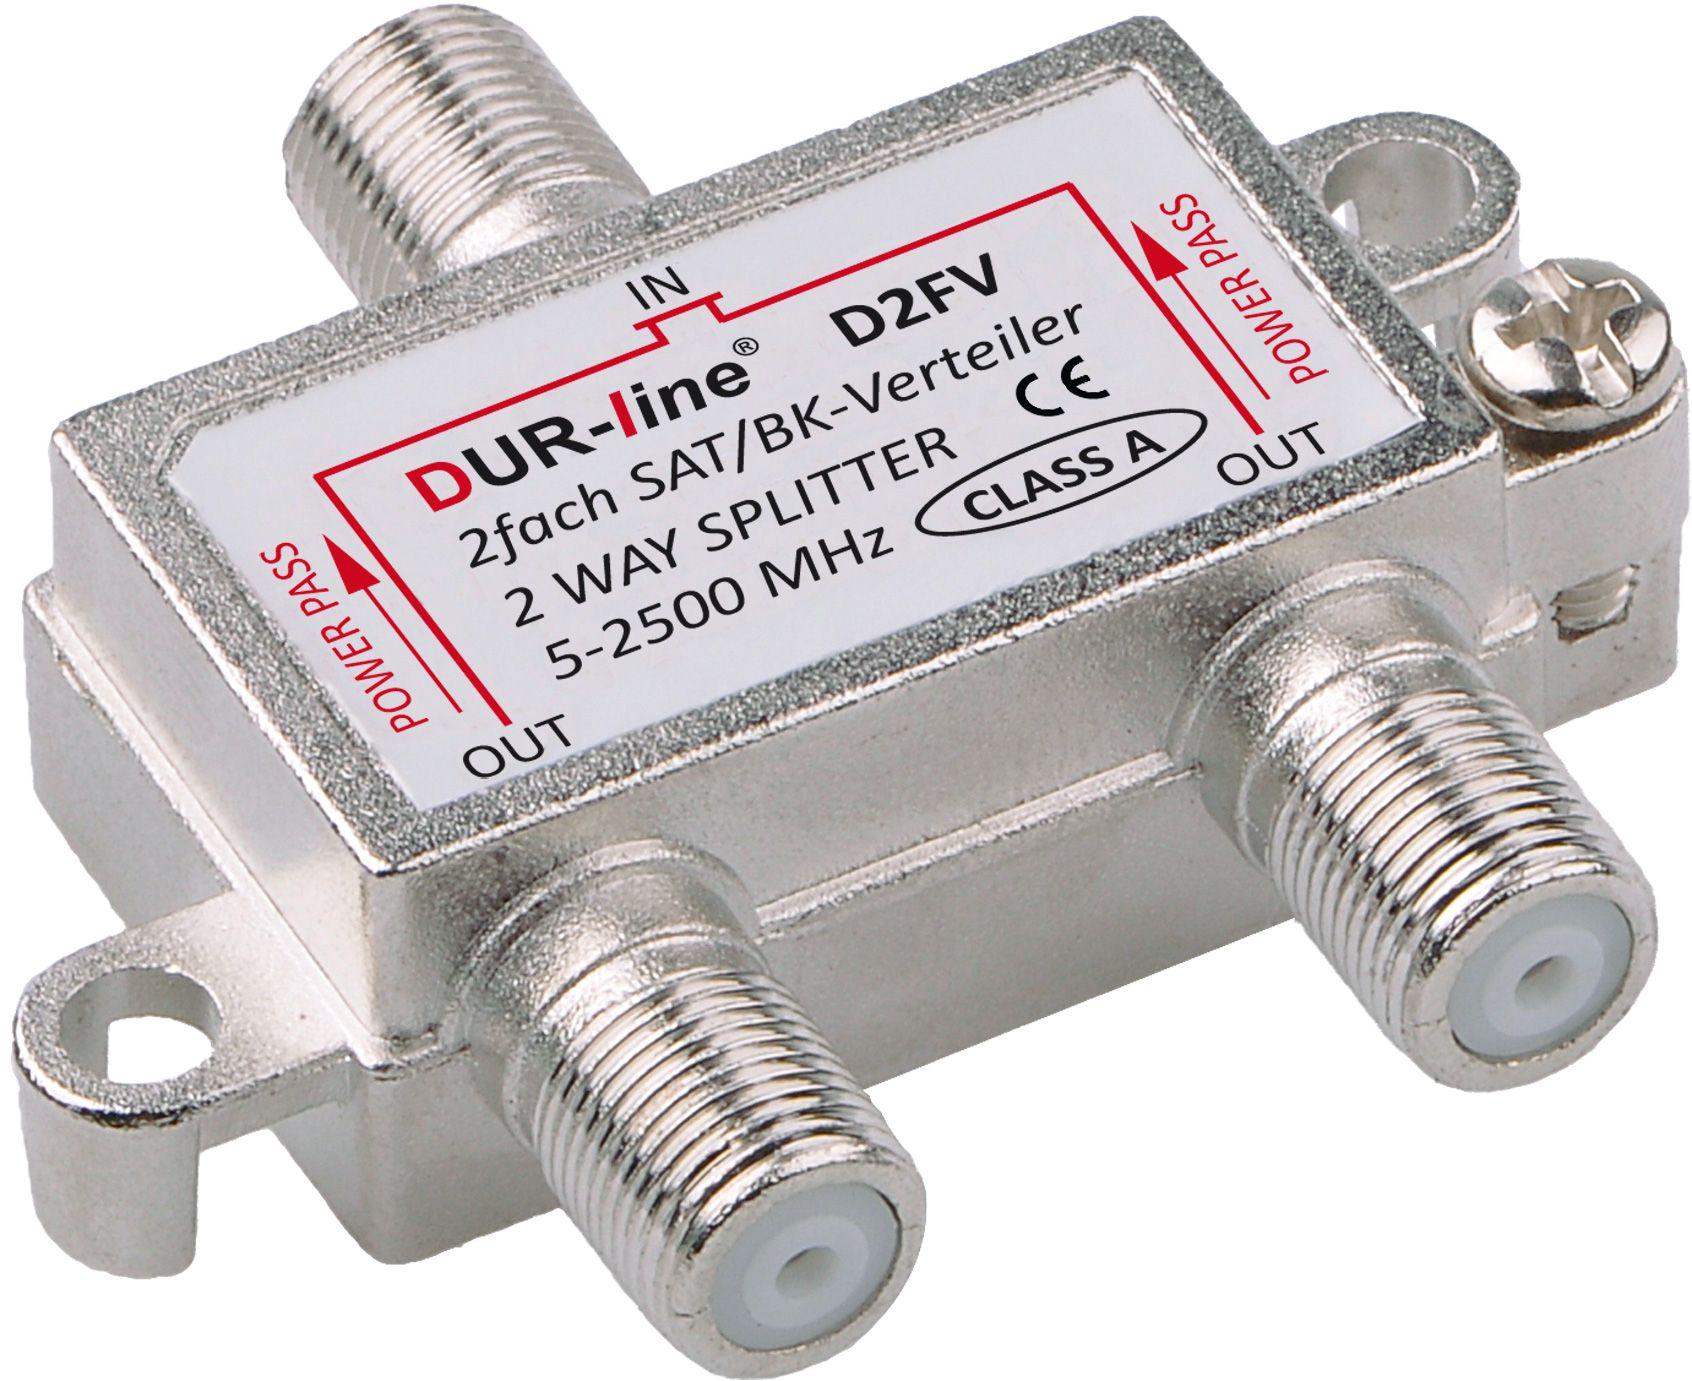 DUR-line D2FV - BK/SAT-Verteiler 2fach